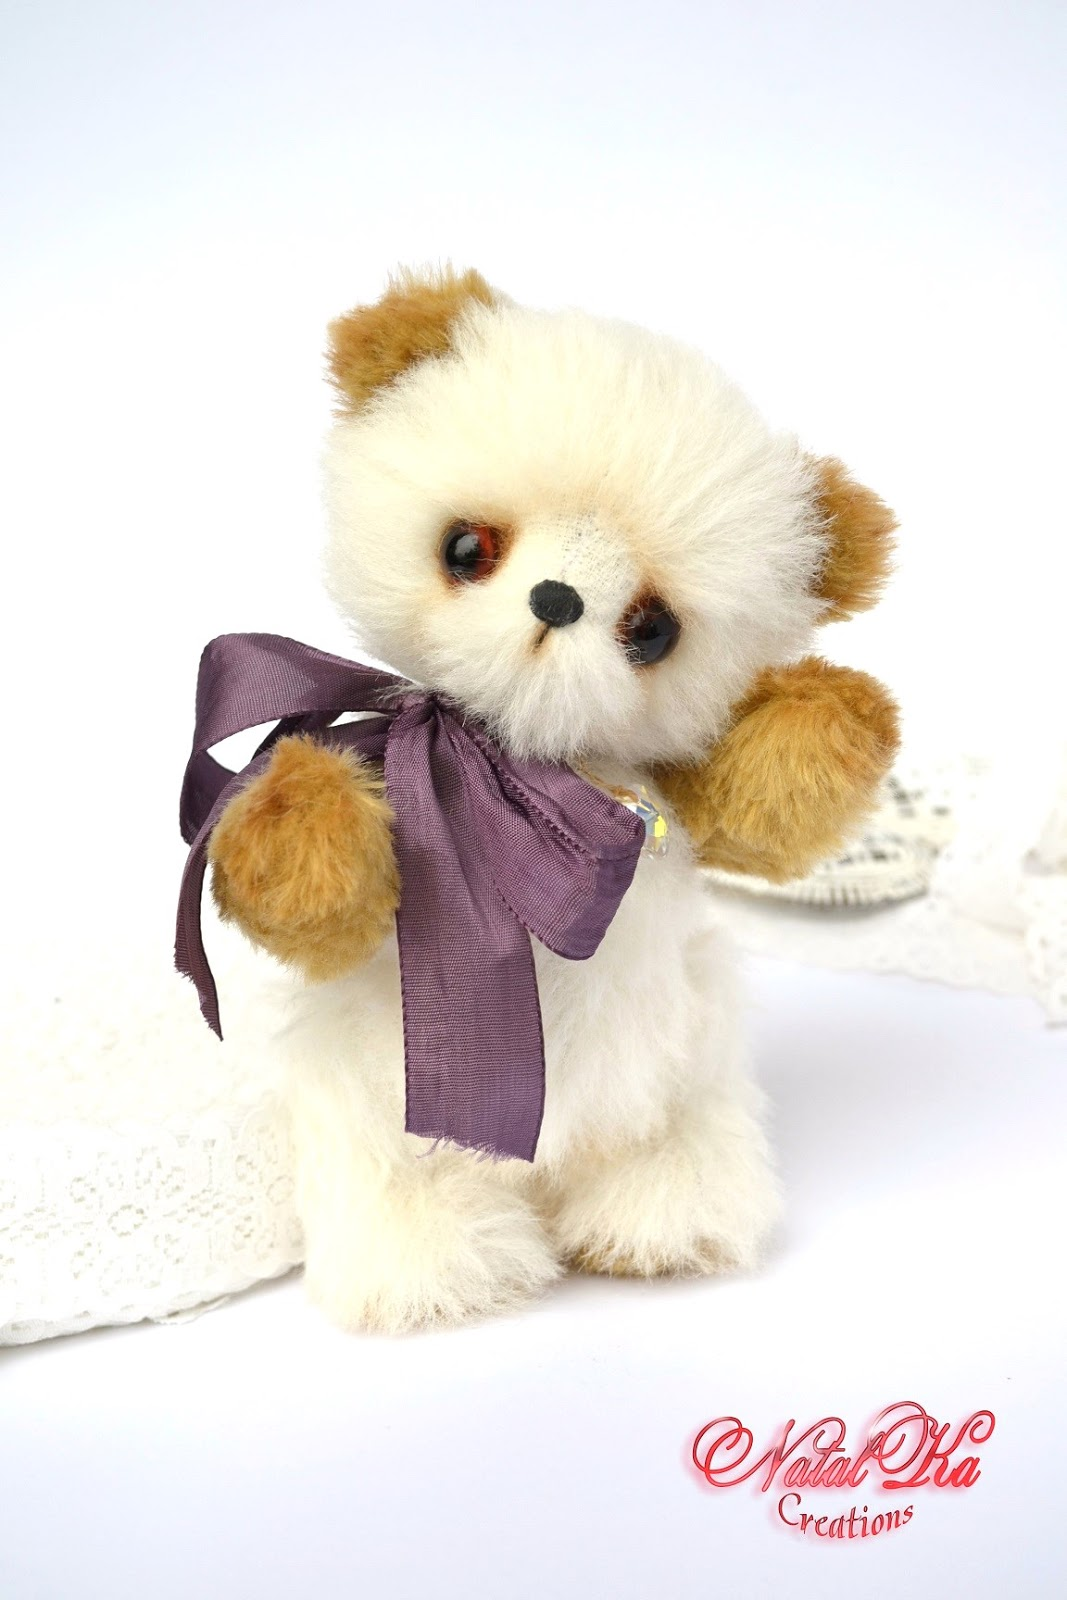 Teddybär, Künstlerbär, Bär, Teddy aus Mohair handgemacht von NatalKa Creations. Artist teddy bear, teddies, teddy bear, mohair, ooak, handmade by NatalKa Creations